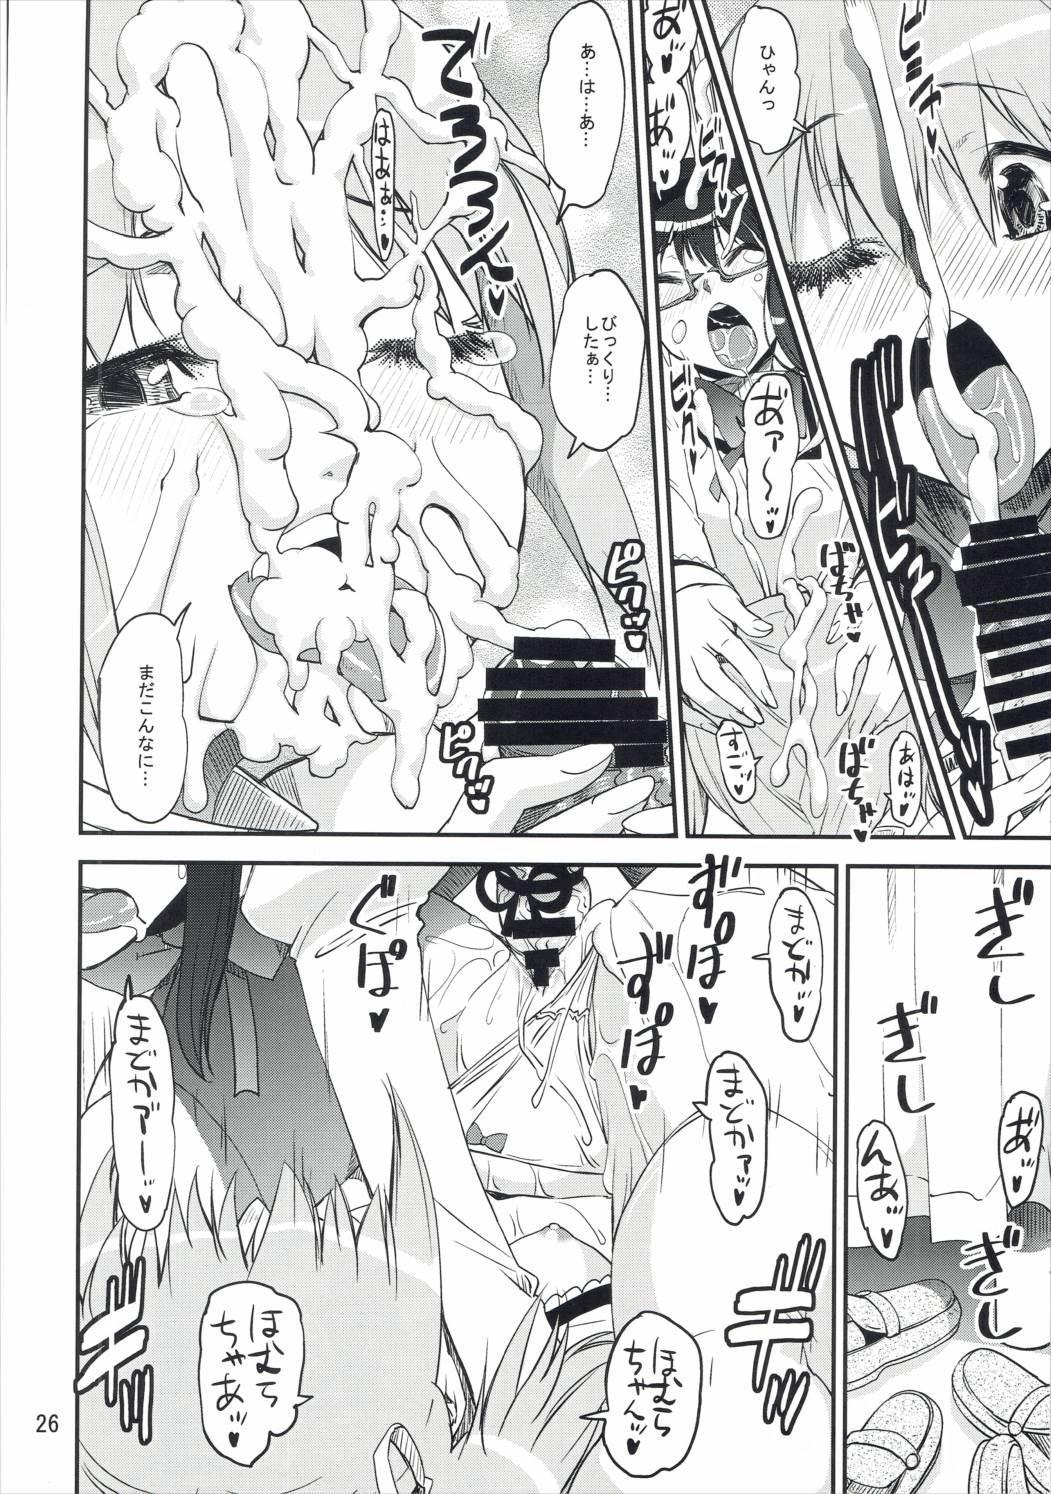 (C89) [KATAMARI-YA (Kanetsuki Masayoshi, Shinama) Noushuku! ! Homumilk (Puella Magi Madoka Magica) 24